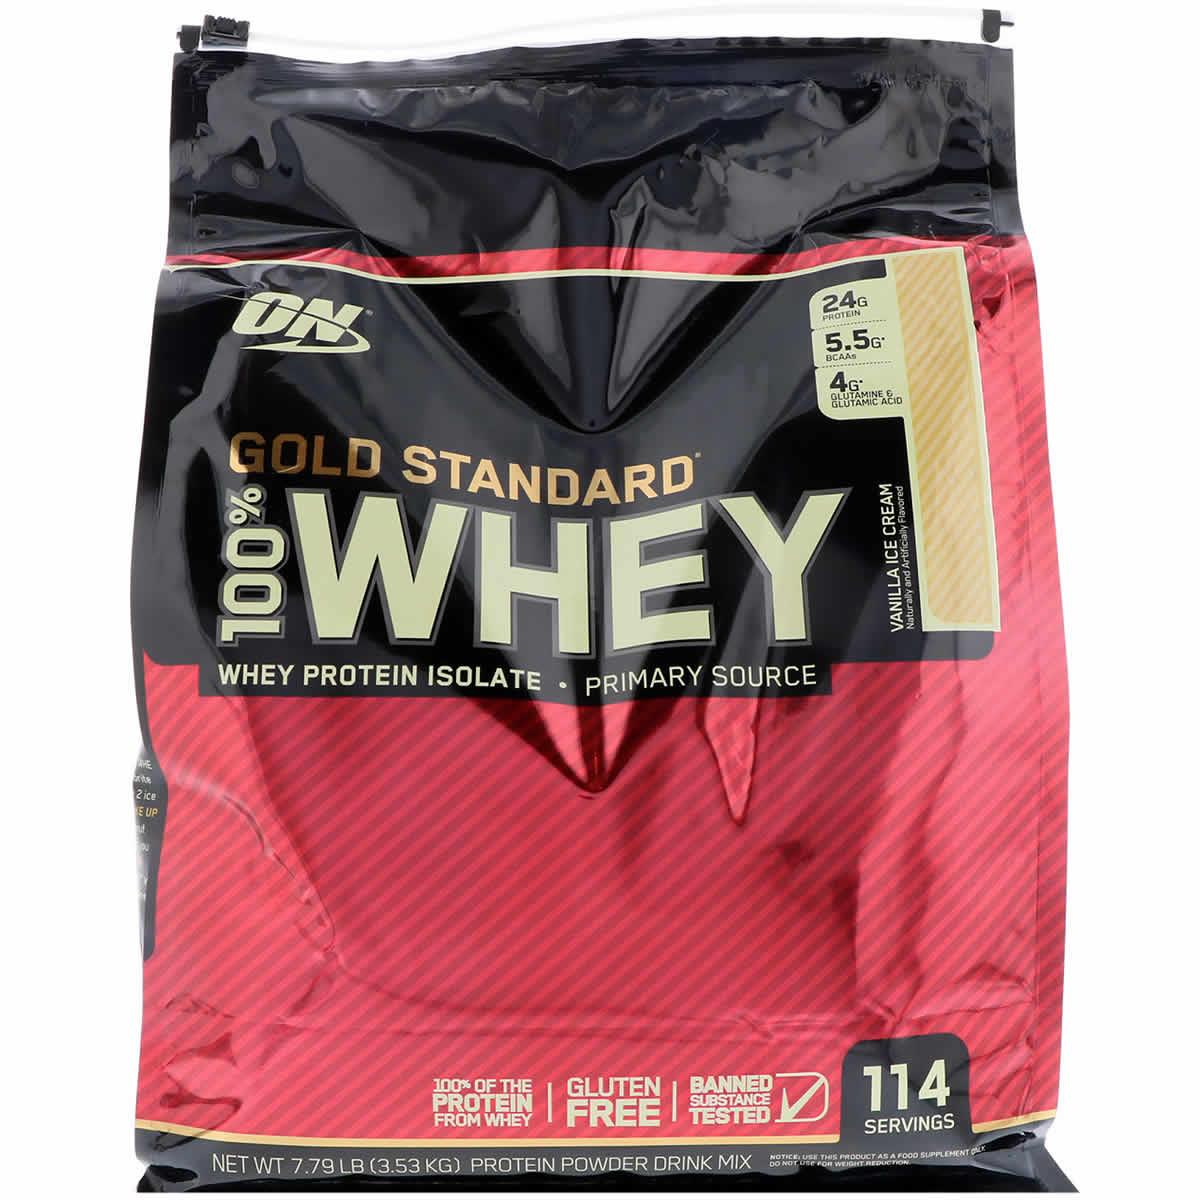 83dd4e775 Optimum Nutrition Gold Standard 100% Whey Protein Powder - 7.6 lbs ...